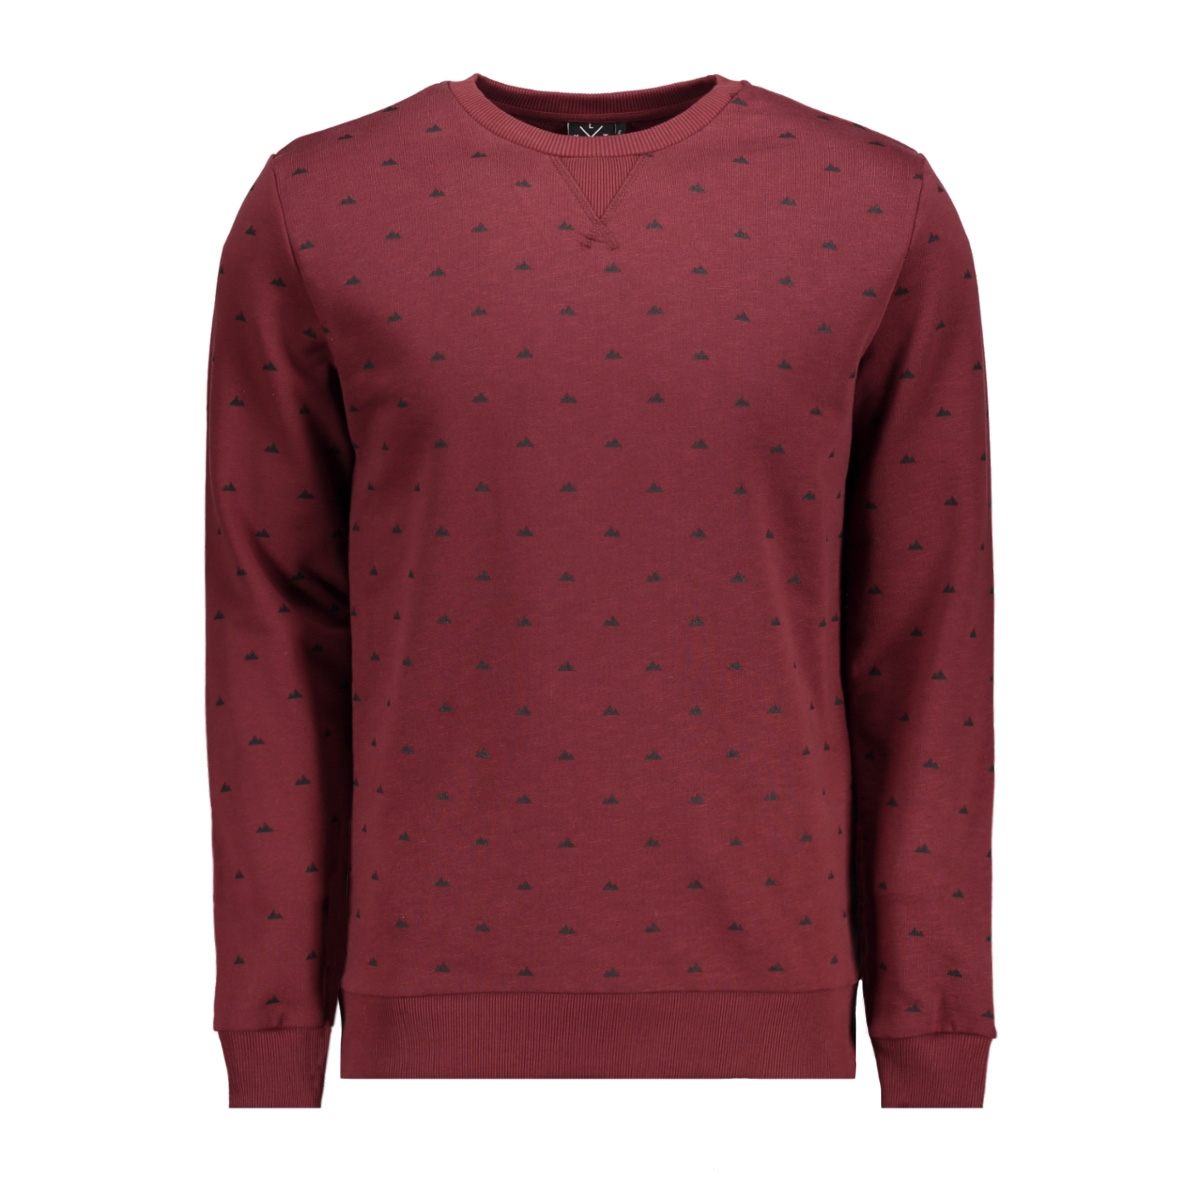 1801041000 kultivate sweater 557 burnt sienna